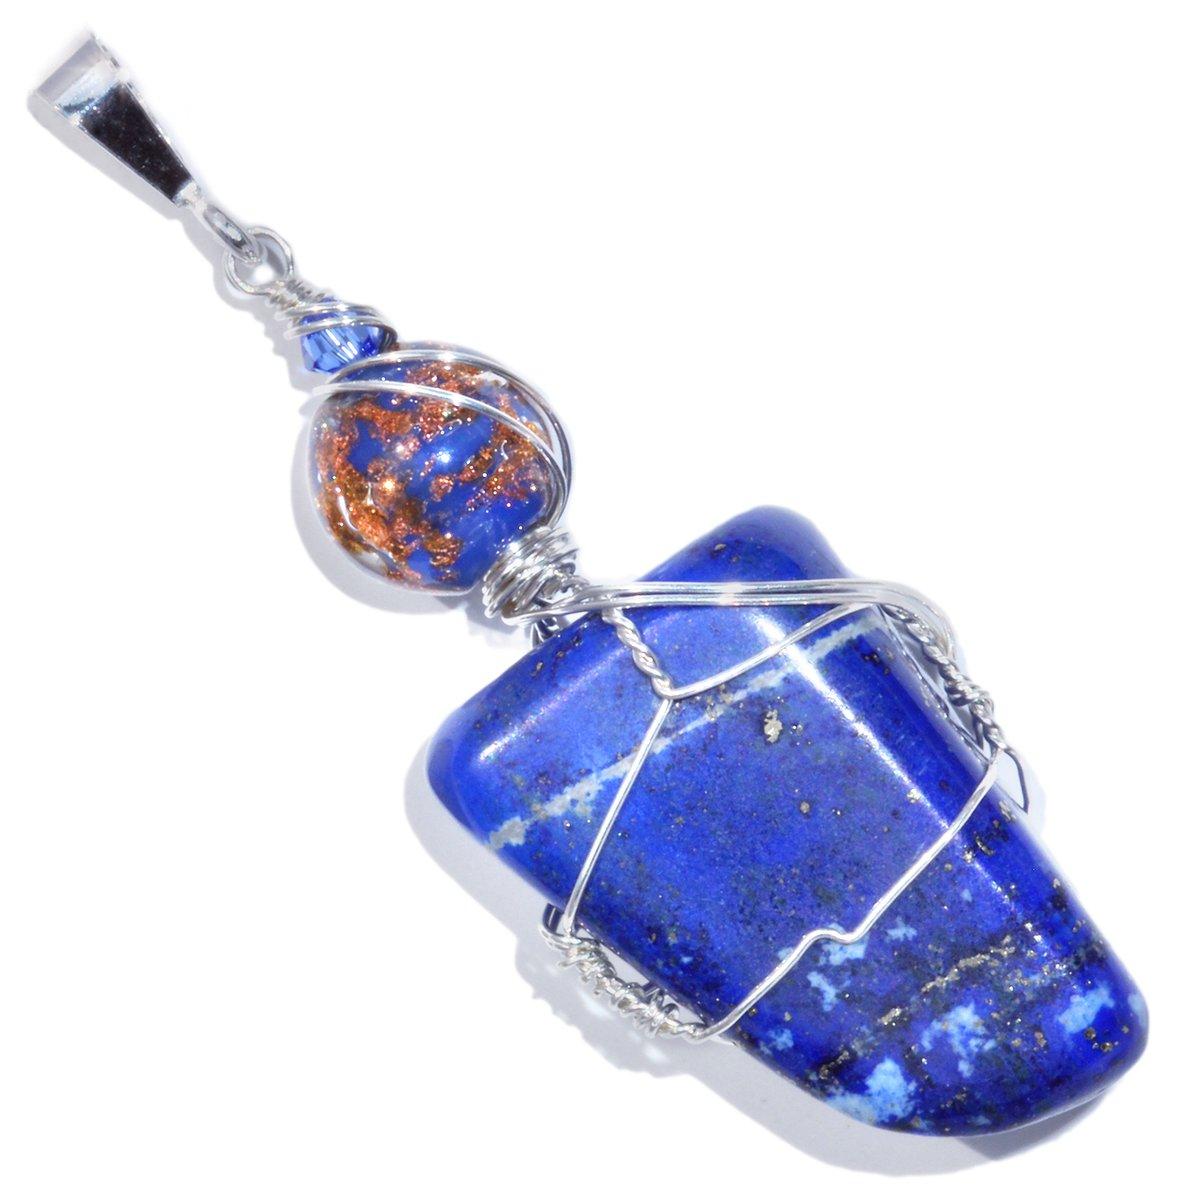 Lapis Lazuli Pendant with Venetian Glass Bead